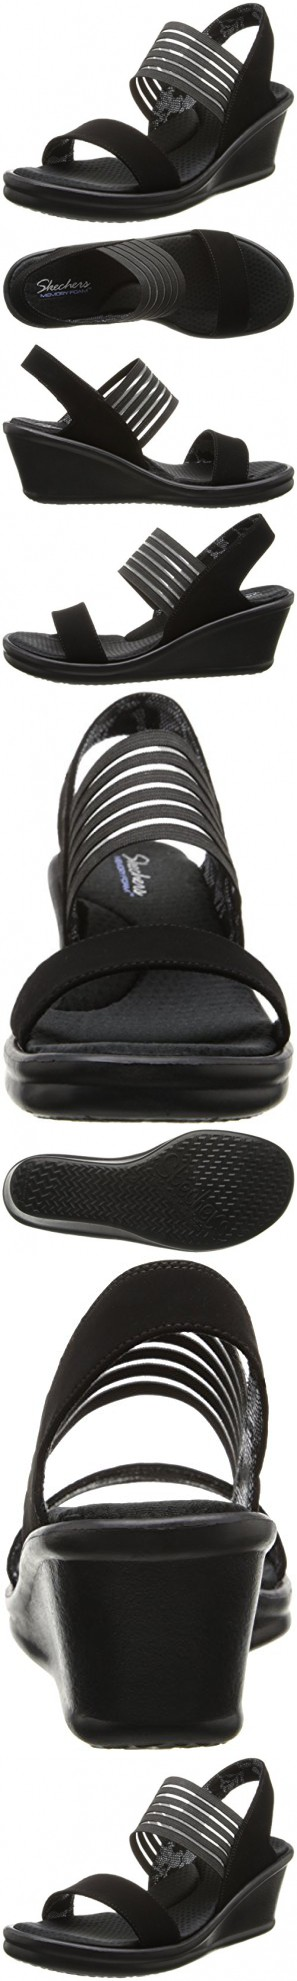 9f37db98af Skechers Cali Women's Rumblers Sci-Fi Wedge Sandal, Black, 11 W US ...